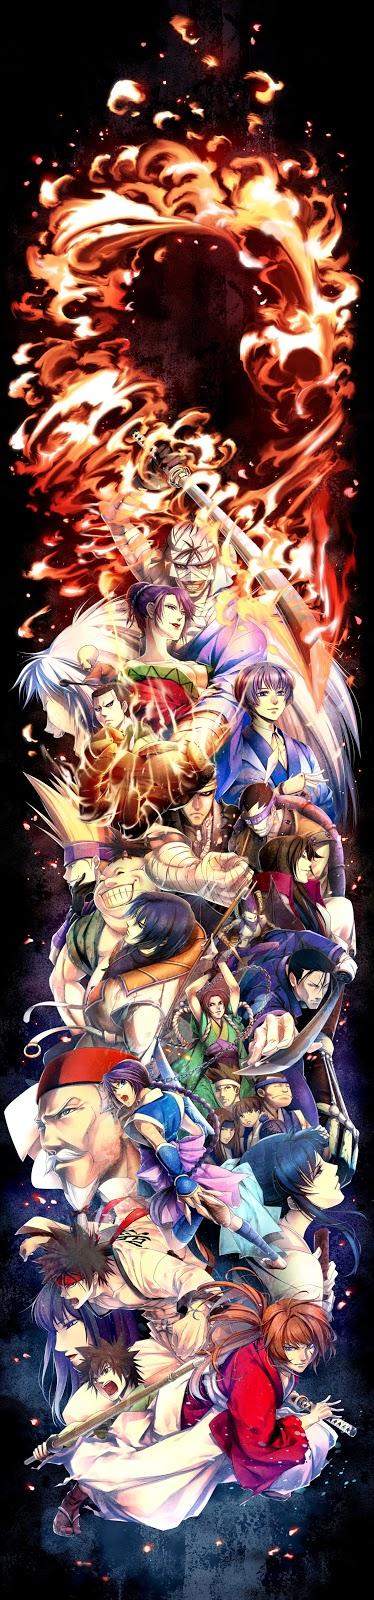 samurai x,anime wallpaper,cool anime wallpaper